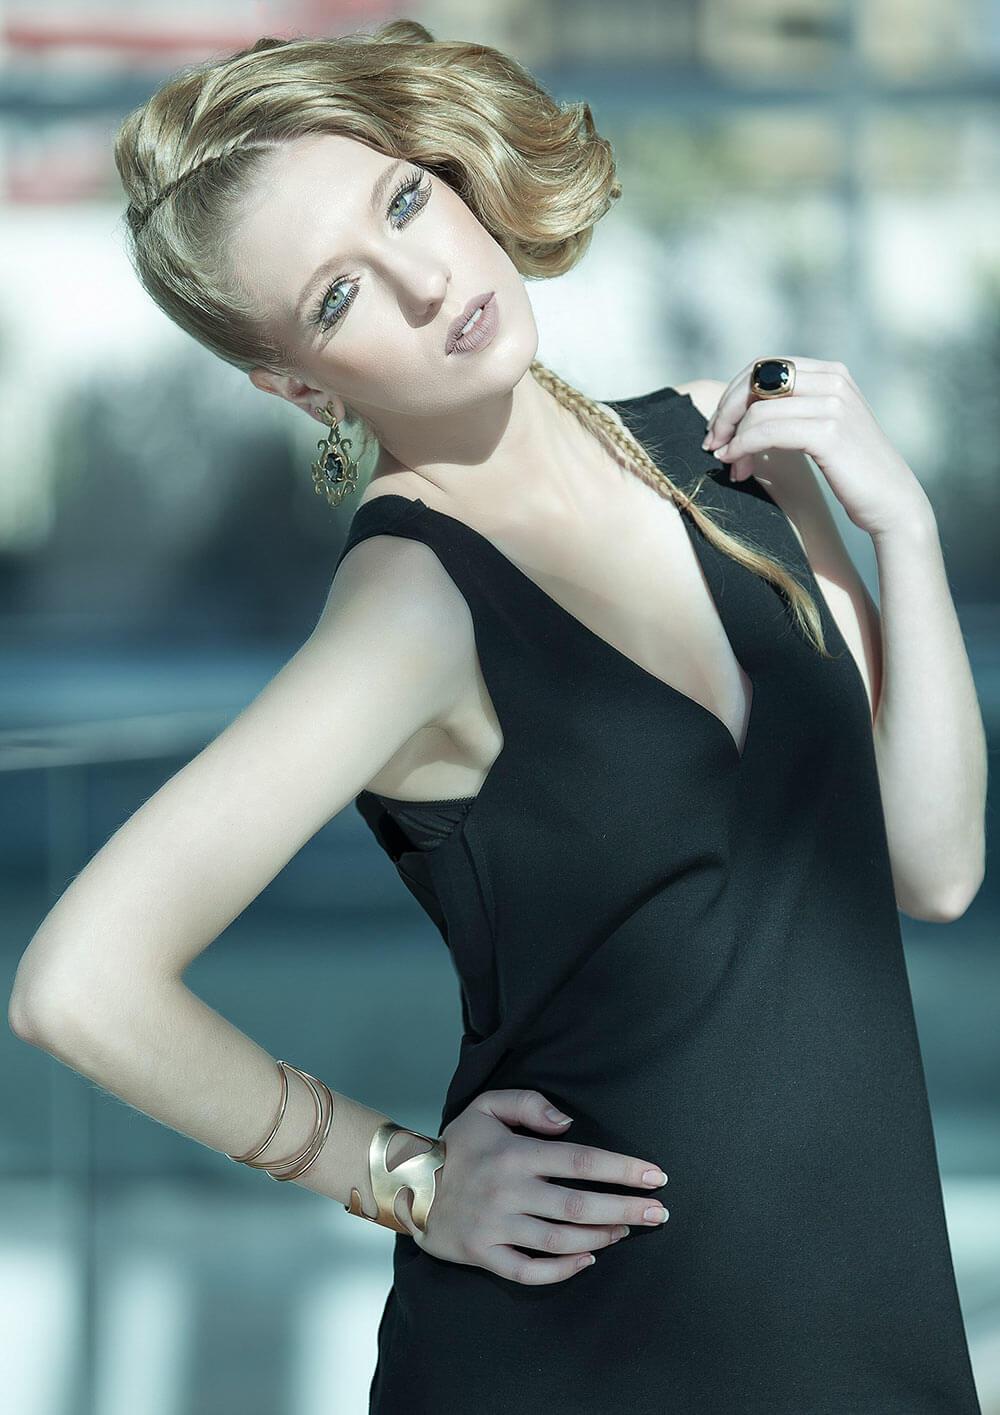 Vestido preto minimalista